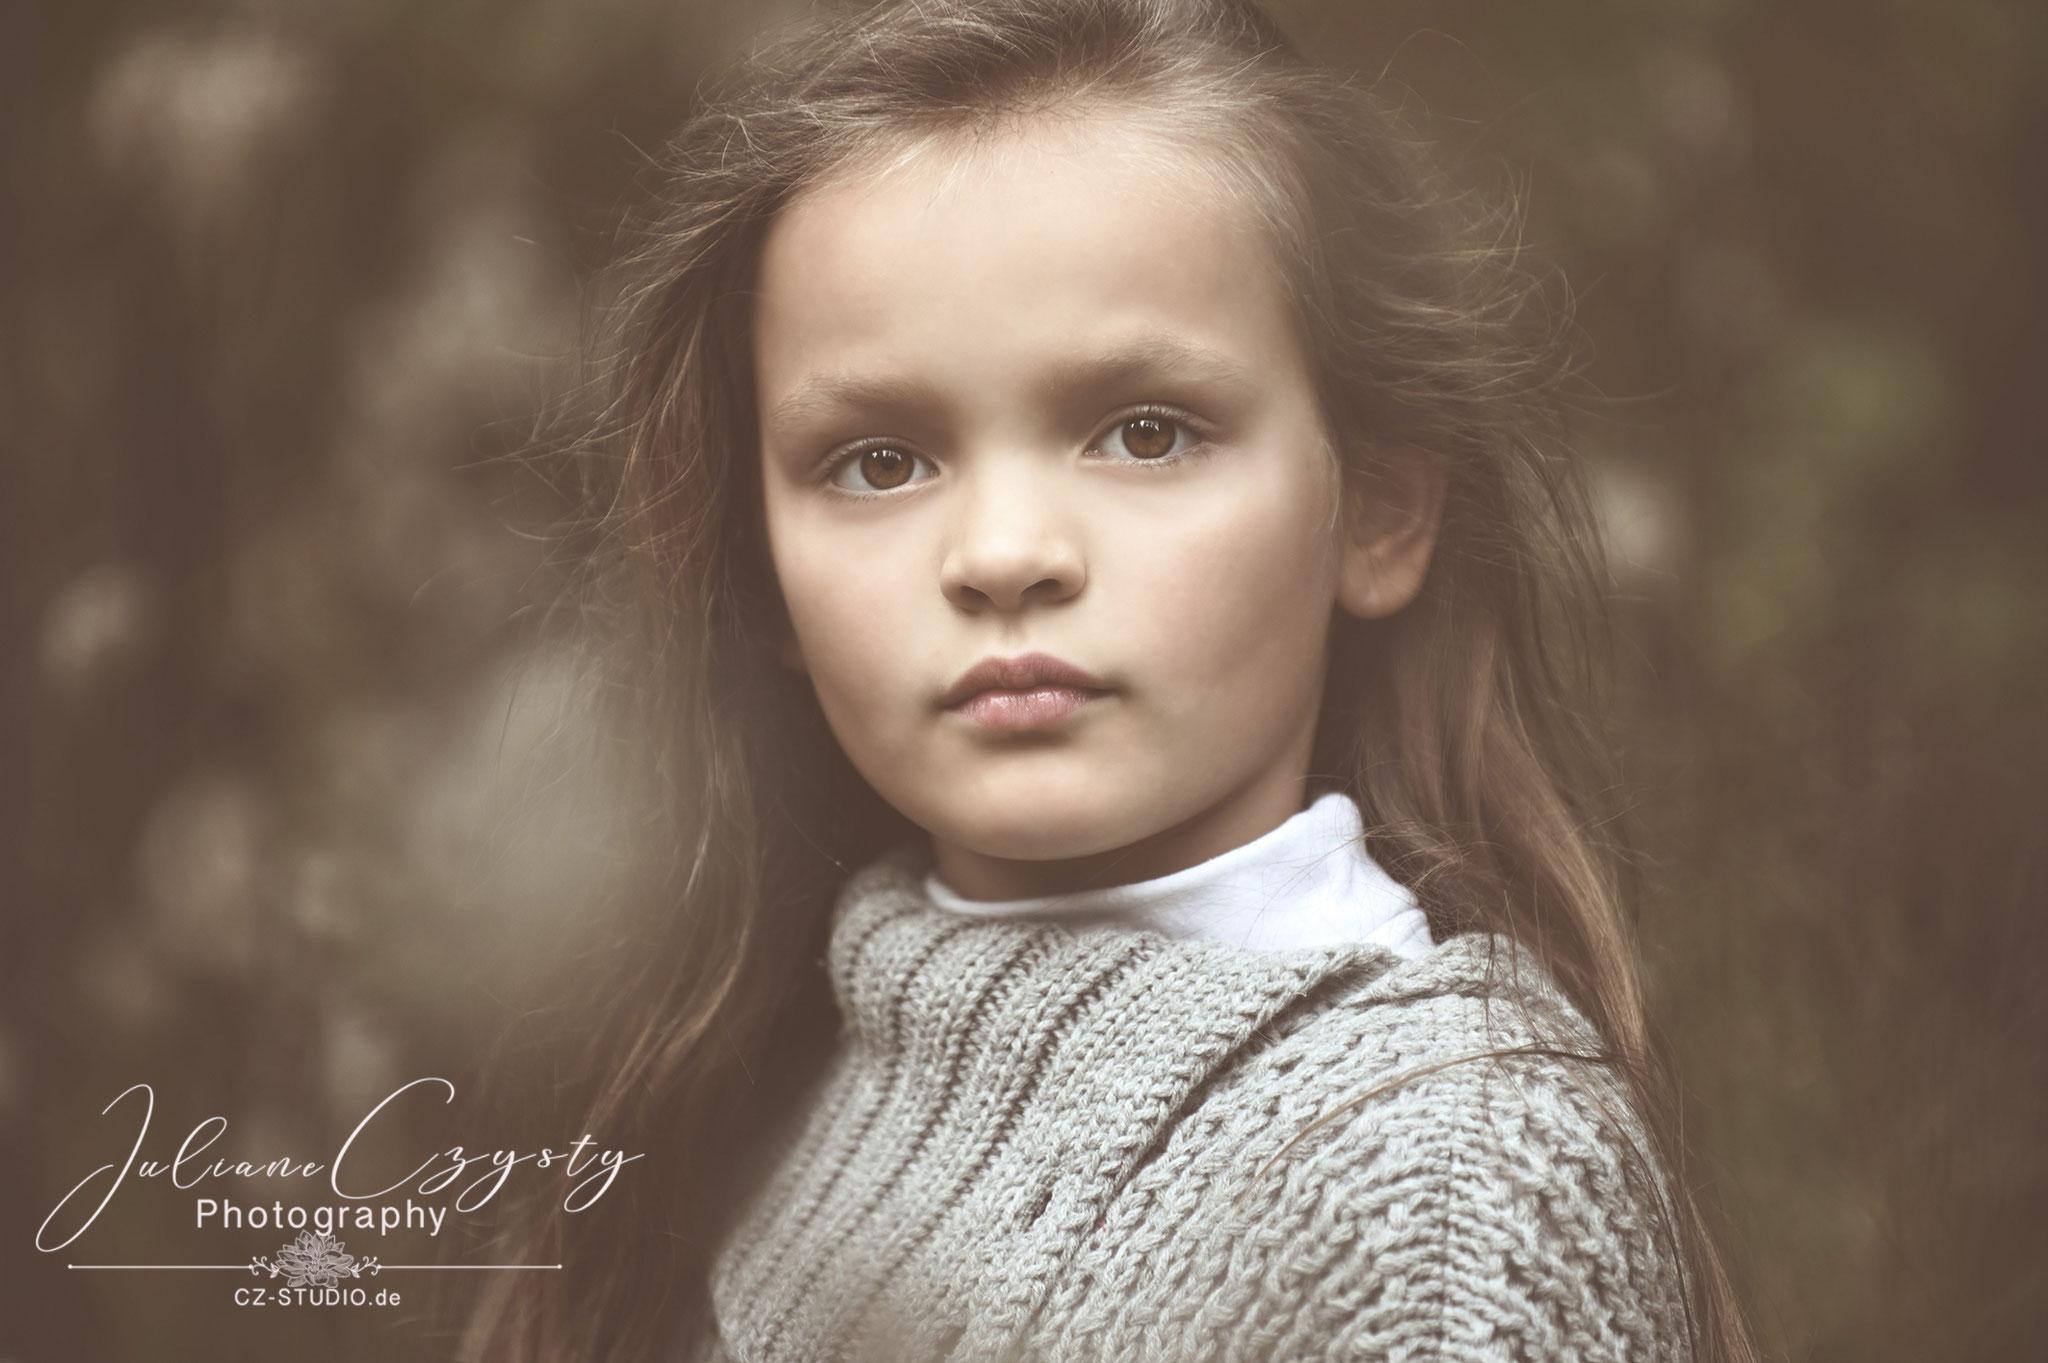 Moderne Kinderfotografie - Juliane Czysty, Fotostudio bei Visselhövede